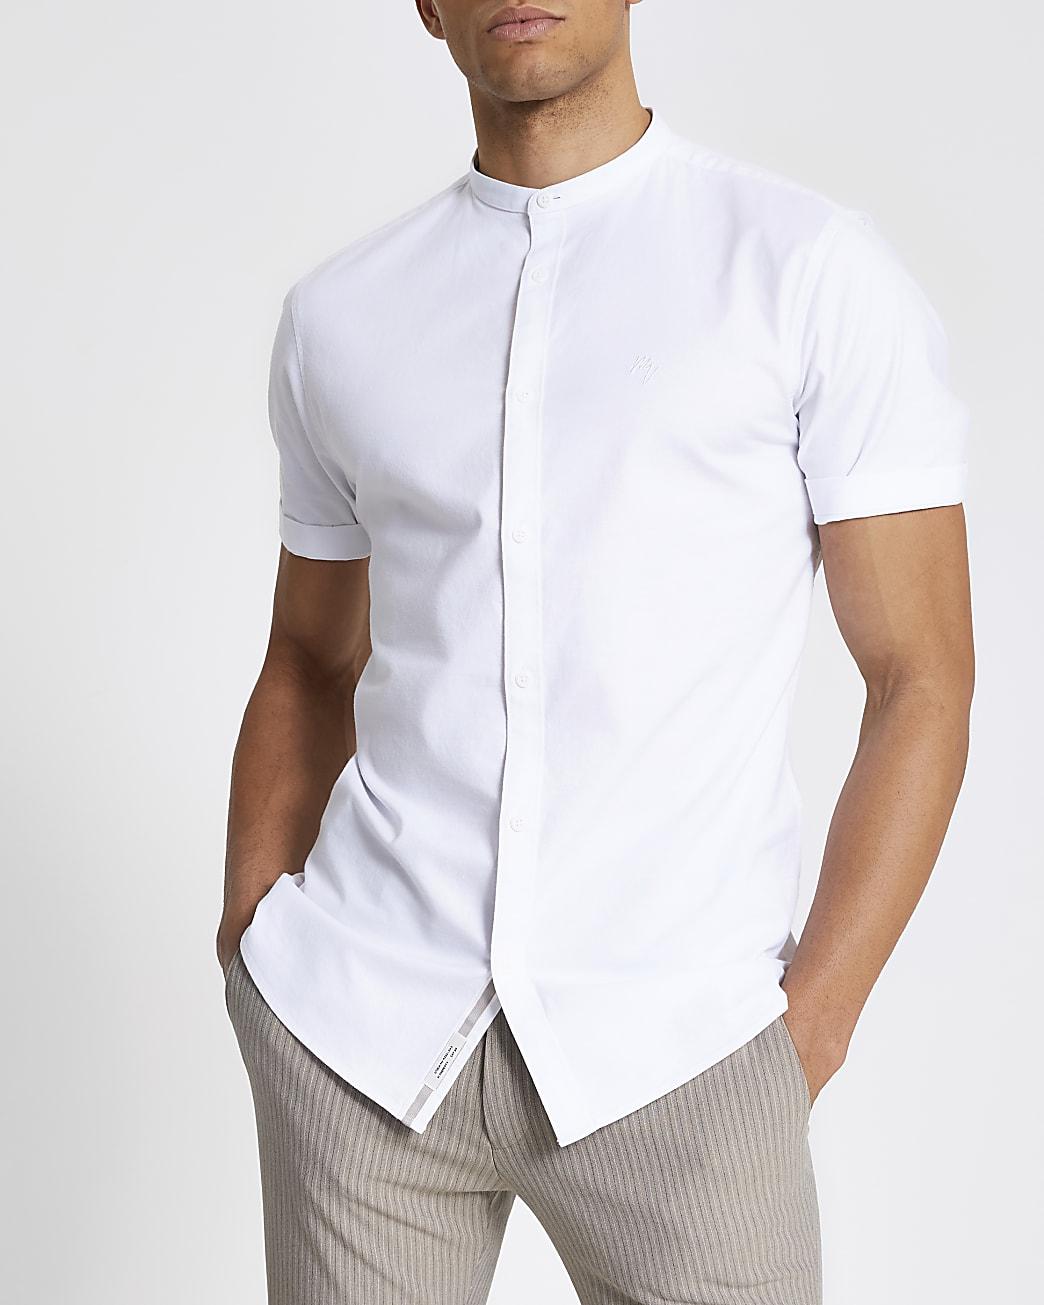 Maison Riviera white short sleeve shirt